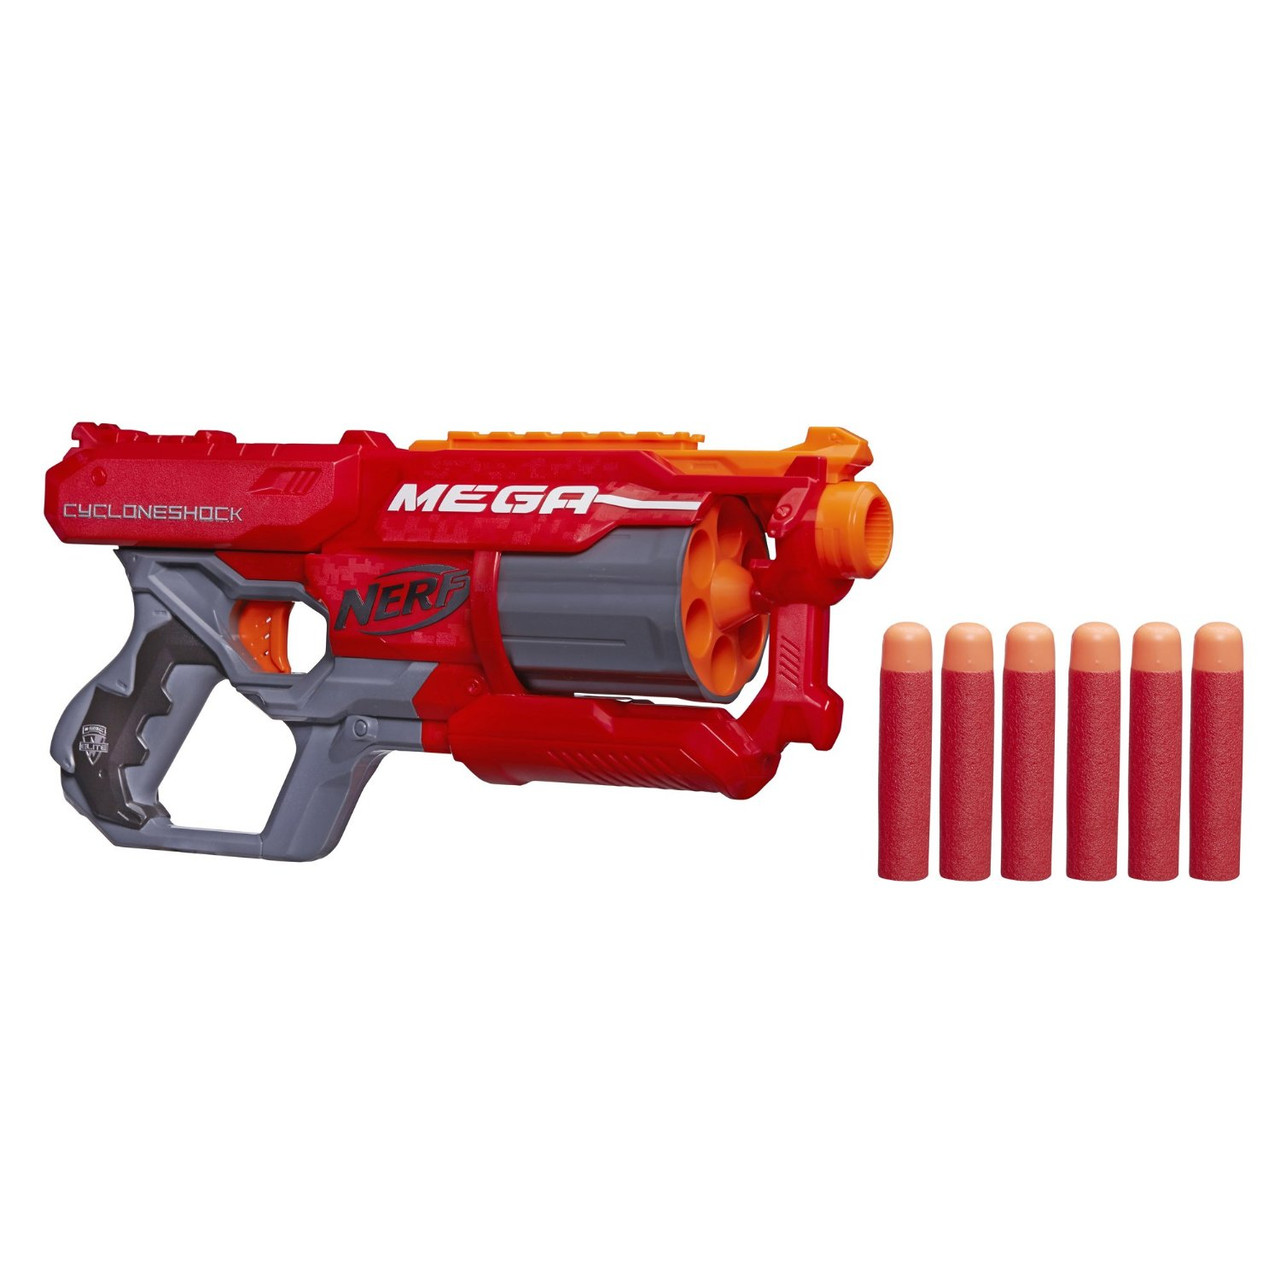 Бластер Nerf N-Strike Циклон-шок Elite Mega CycloneShock Blaster